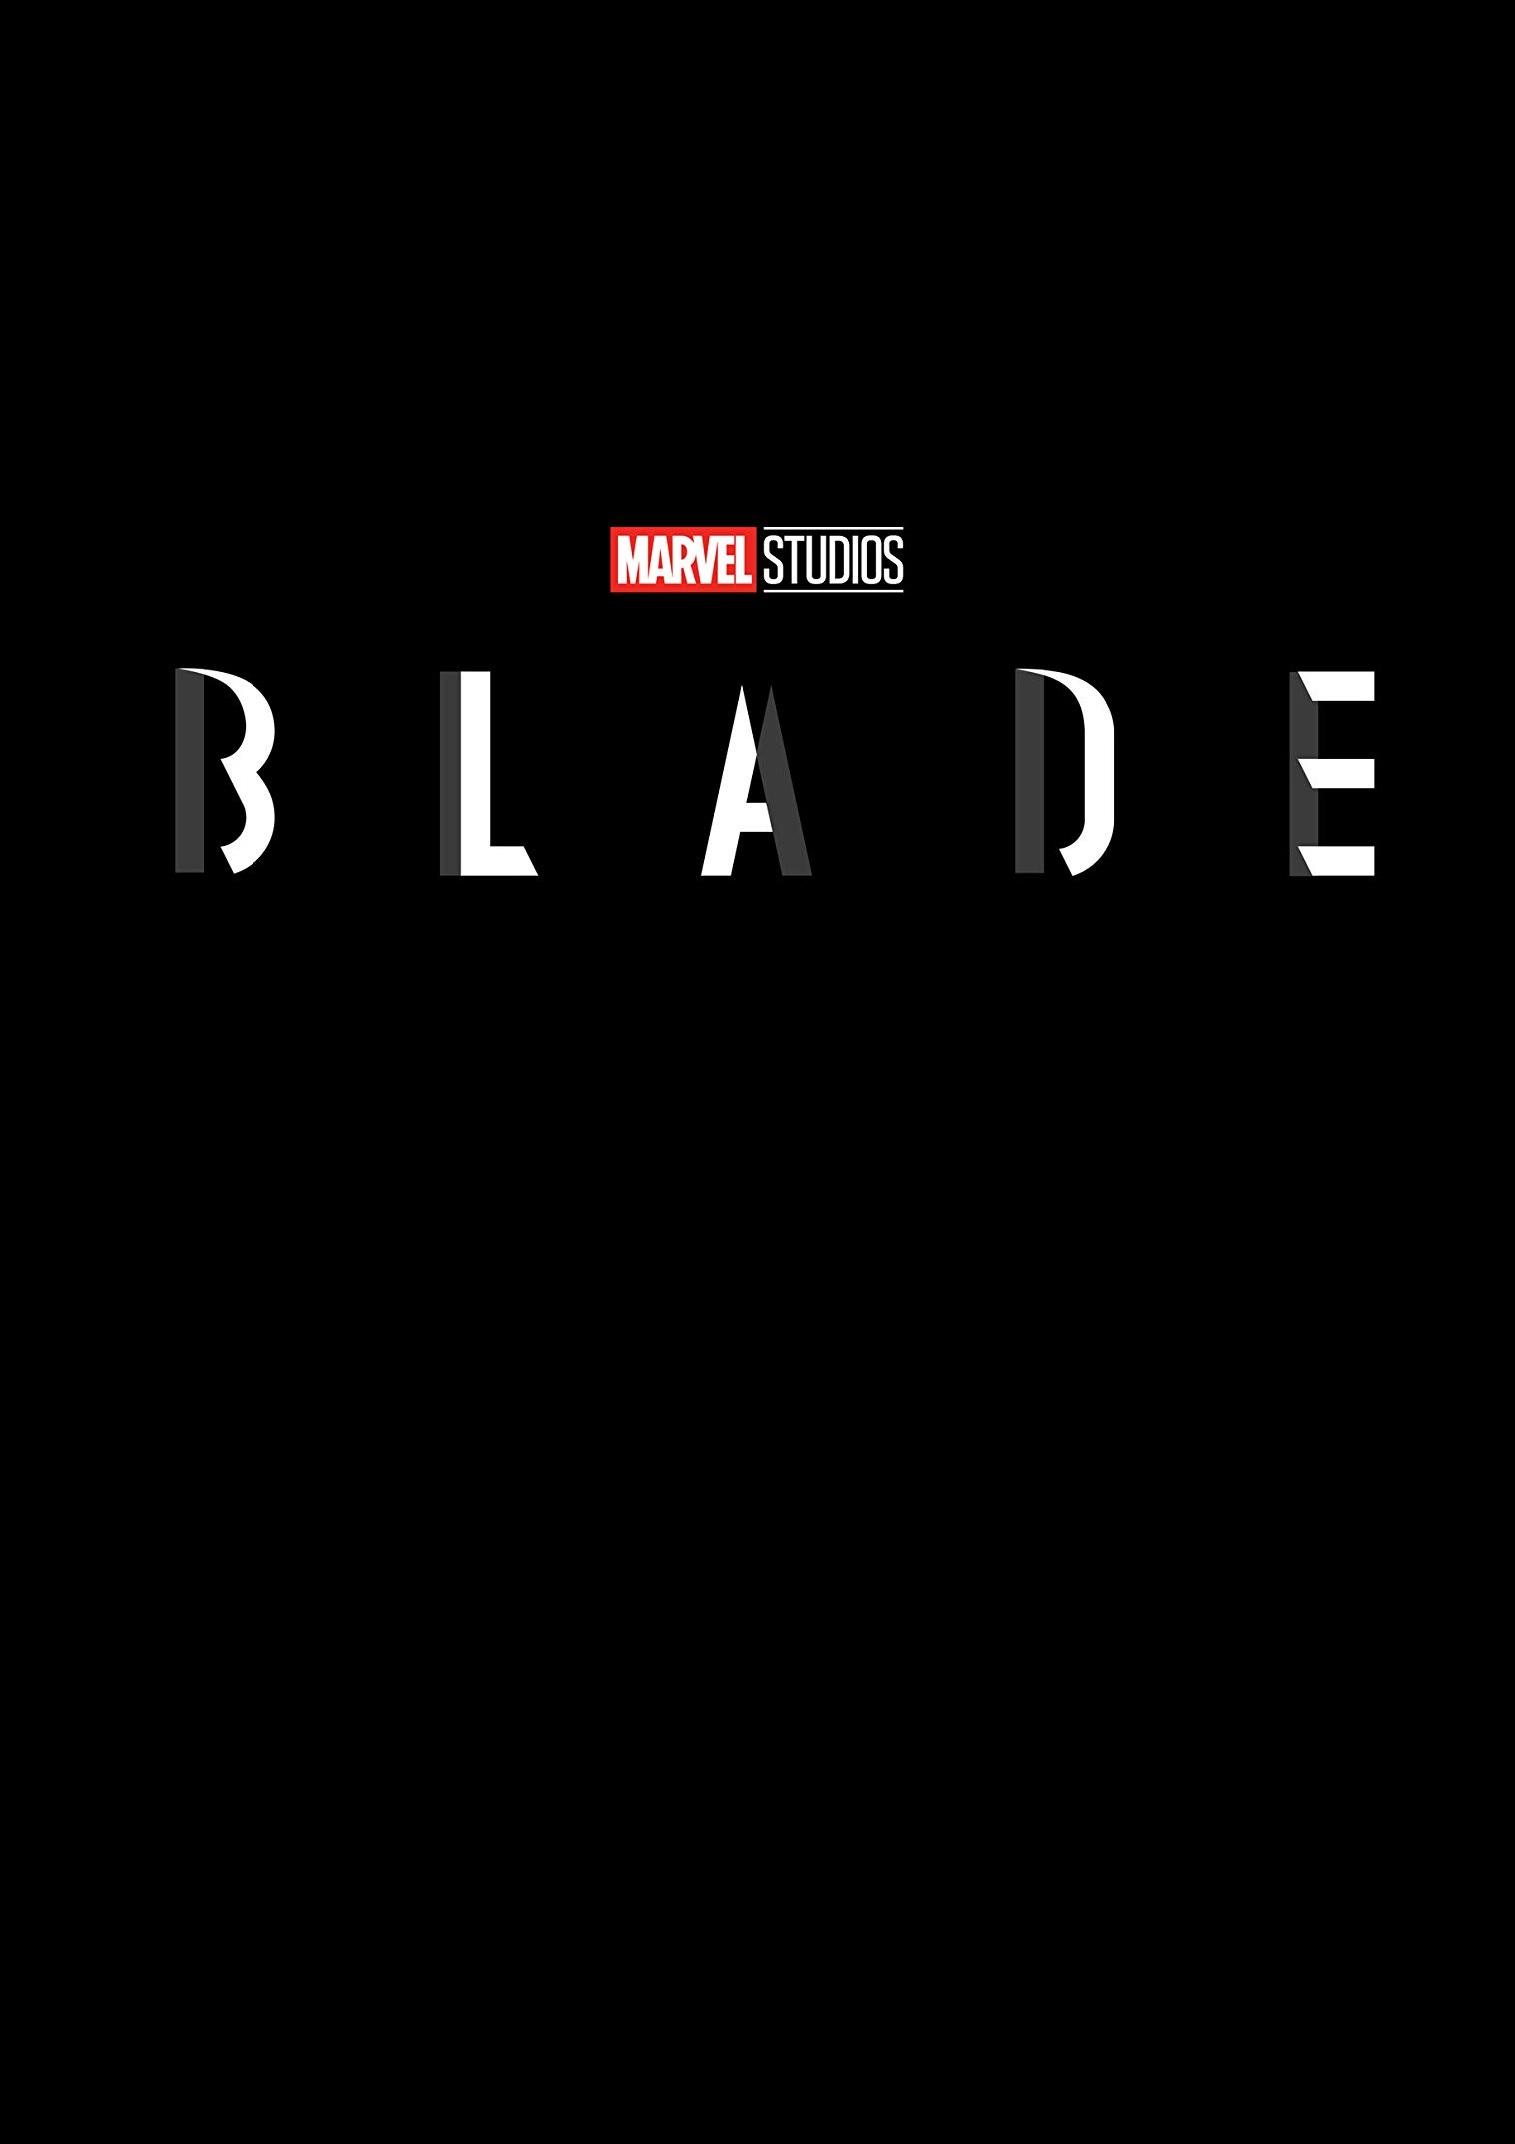 Download Filme Blade Torrent 2021 Qualidade Hd